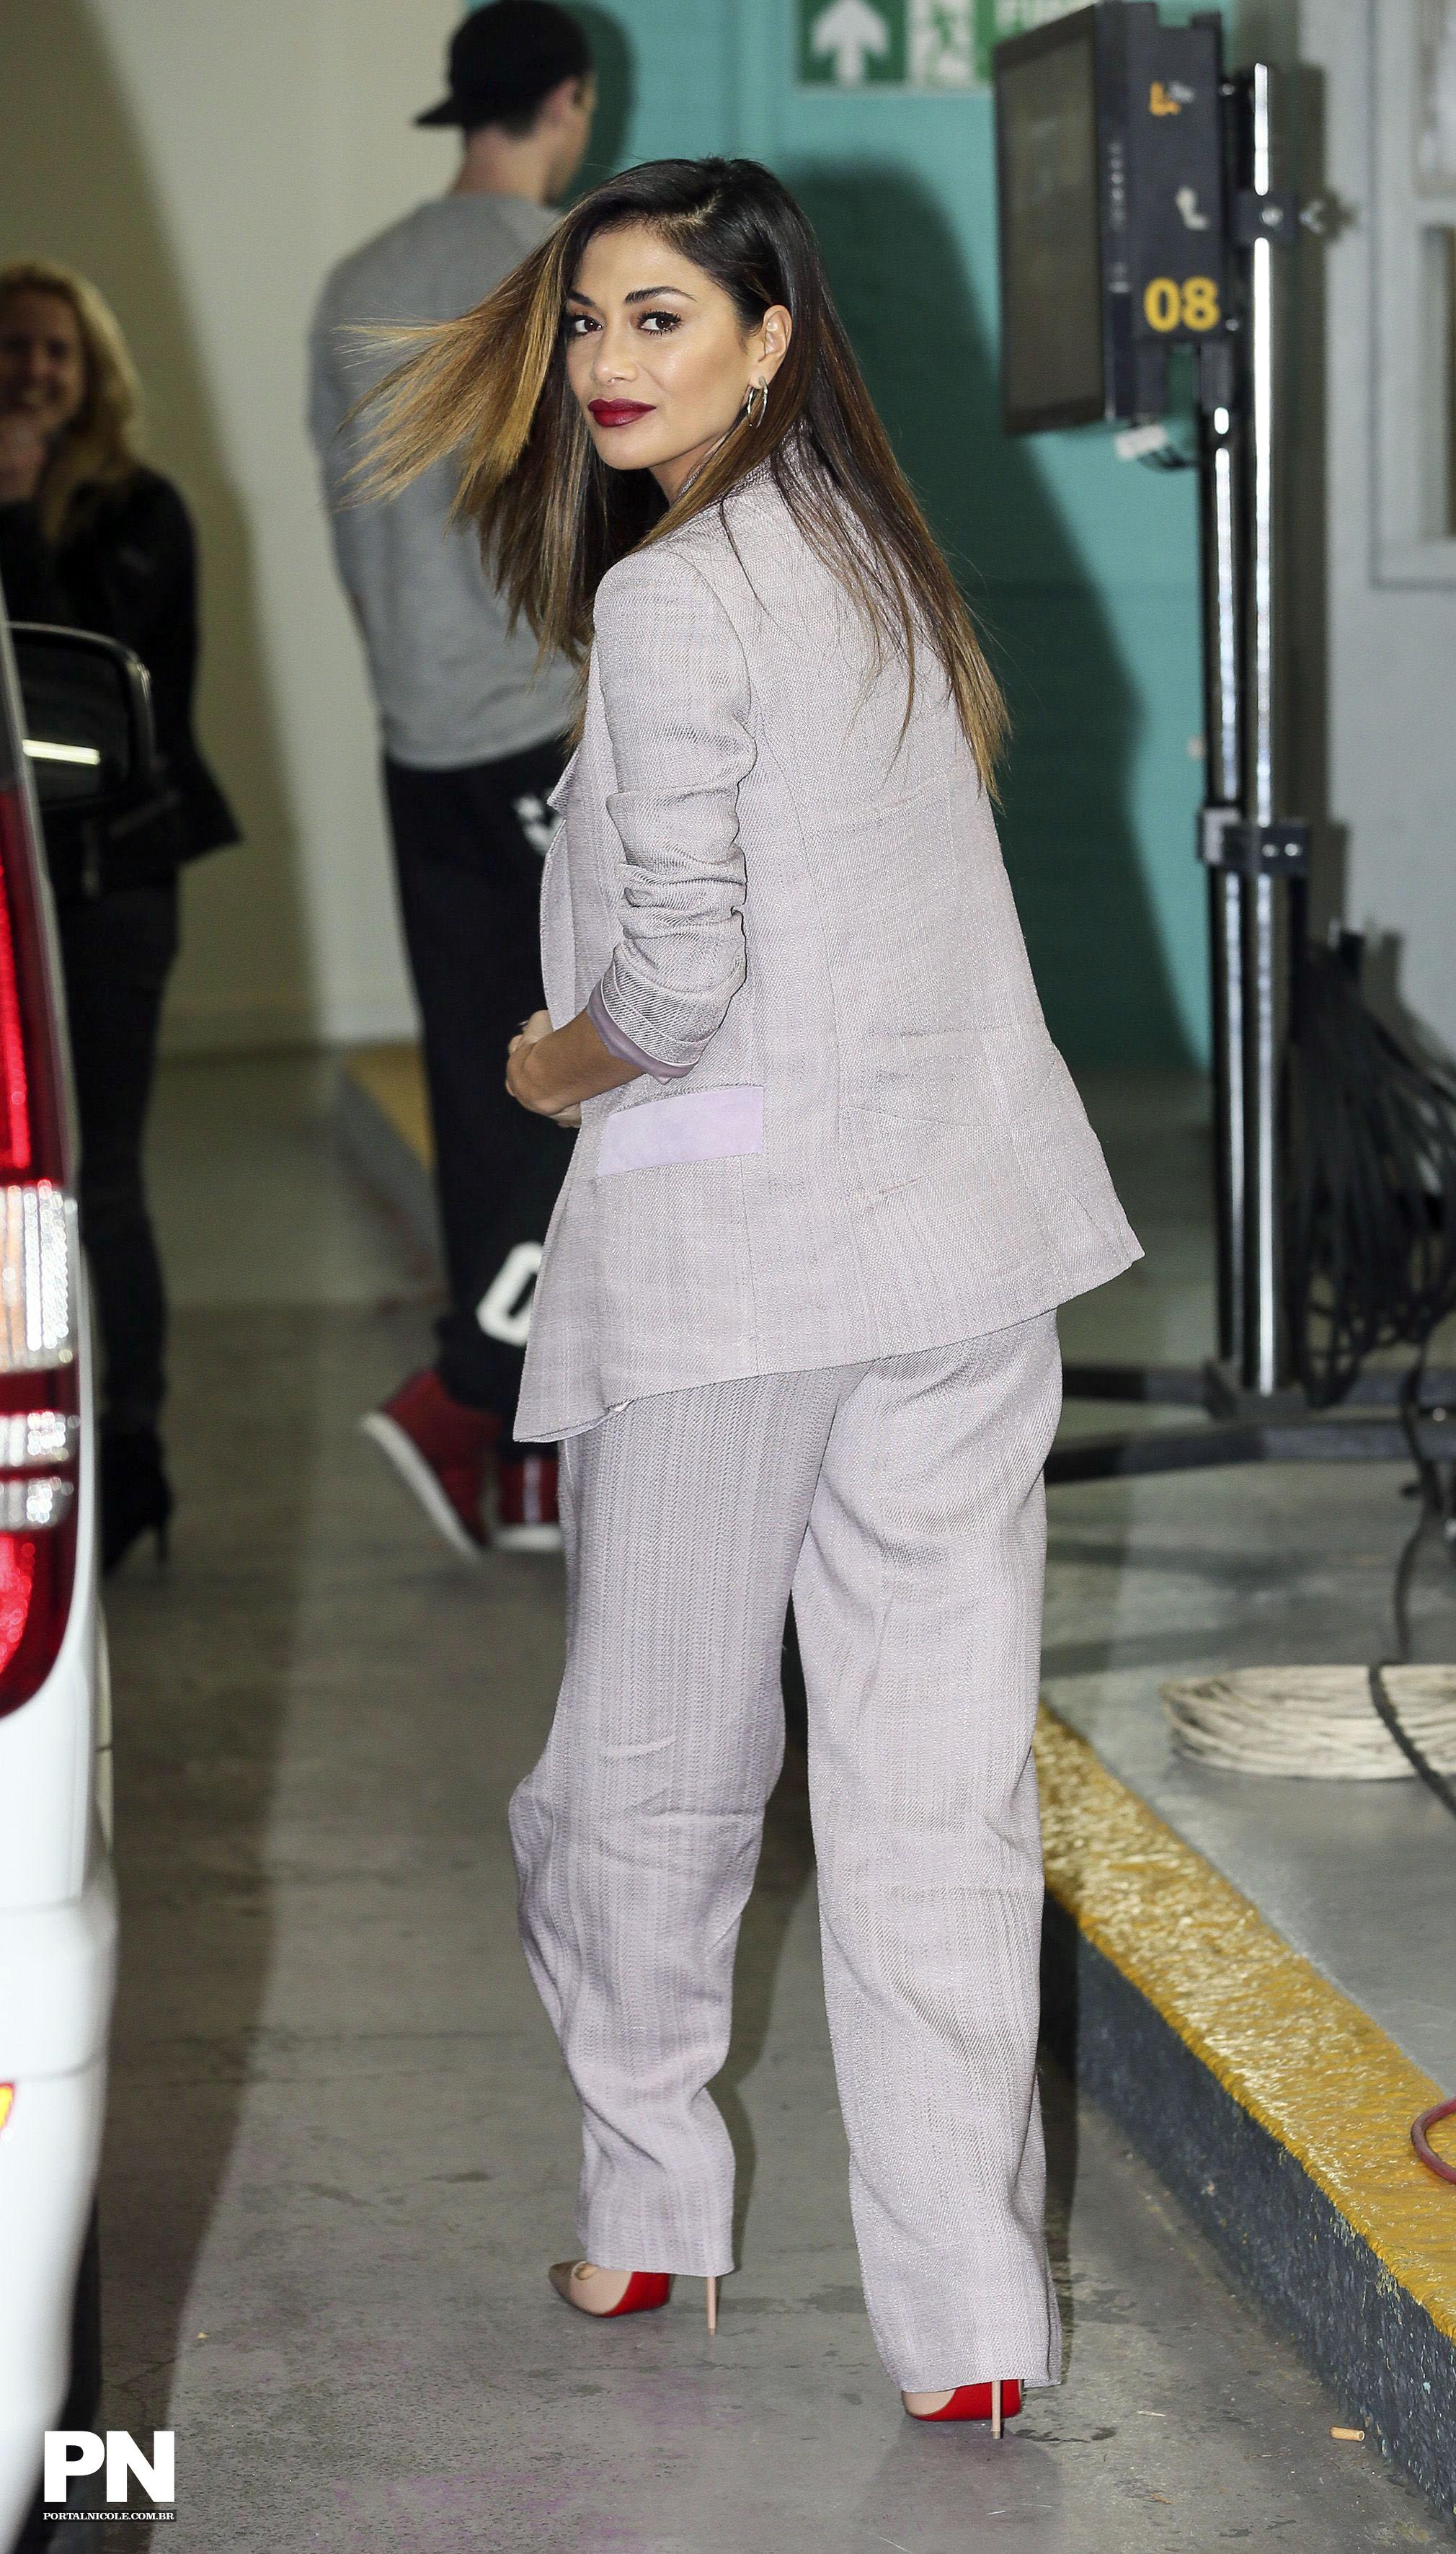 Nicole Scherzinger >> Candids/Apariciones/Shoots - Página 11 000009